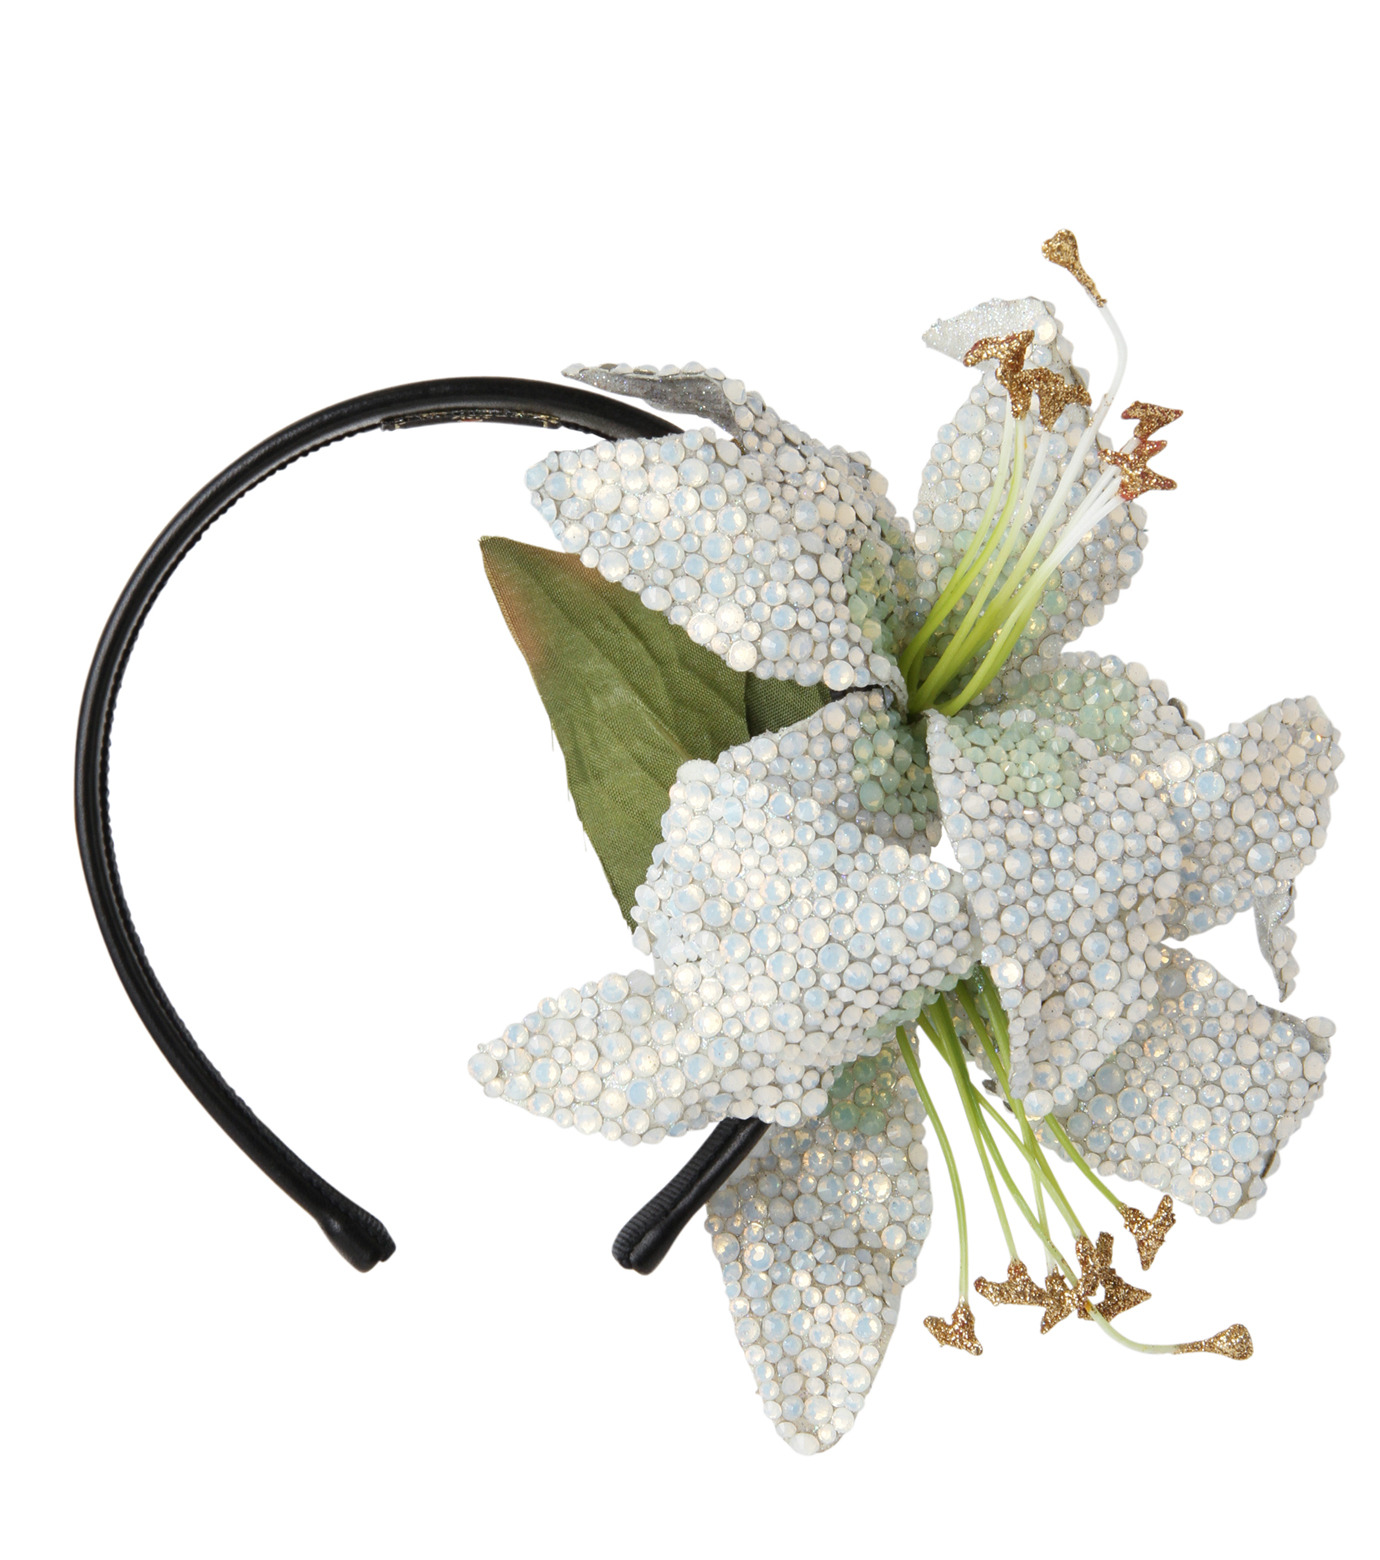 Piers Atkinson(ピアーズ アトキンソン)のSwarovski Crystal Encrusted Lilyes-WHITE(アクセサリー/accessory)-PA-24-4 拡大詳細画像1